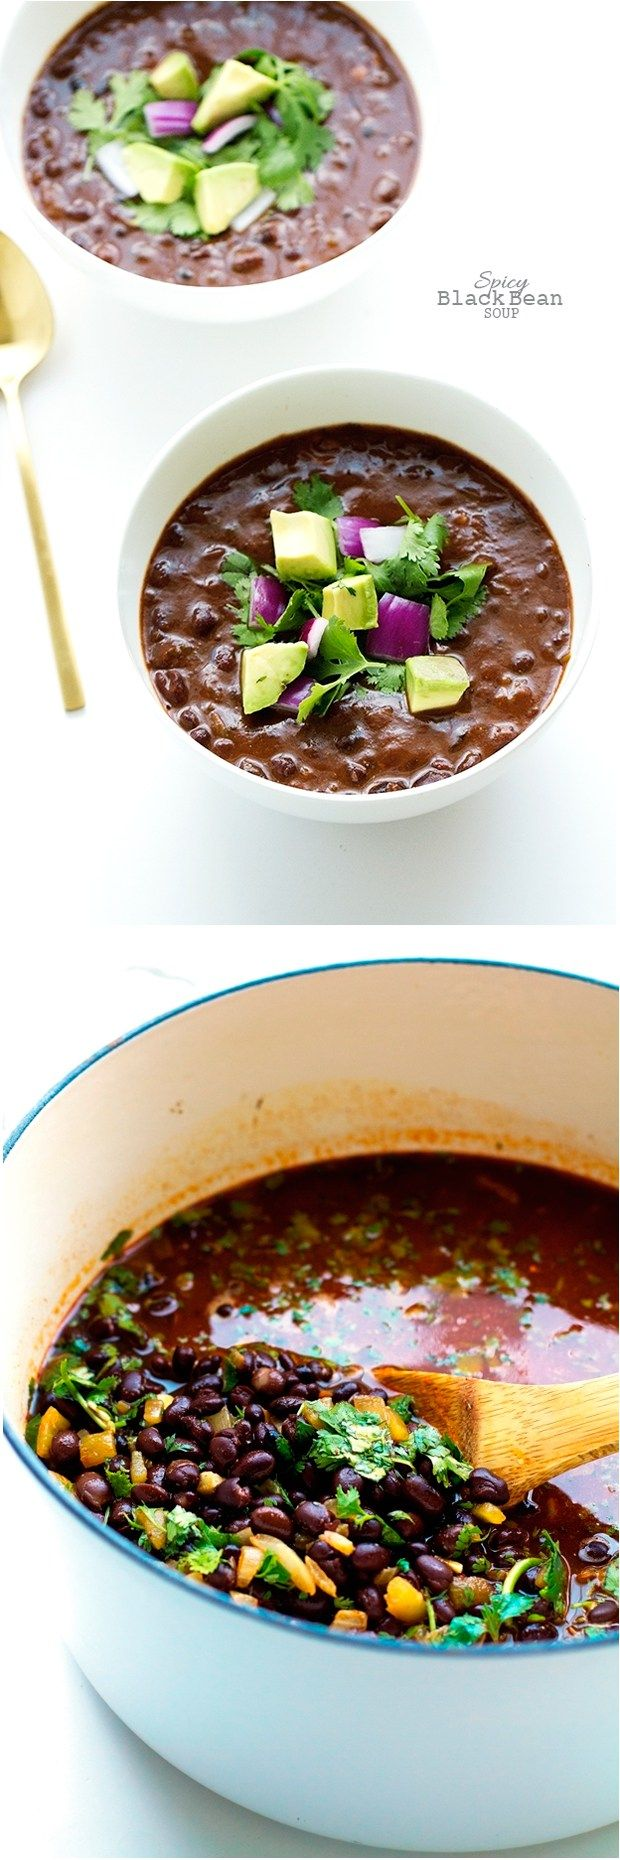 Spicy Black Bean Soup Recipe | Black bean soup and Bean soup